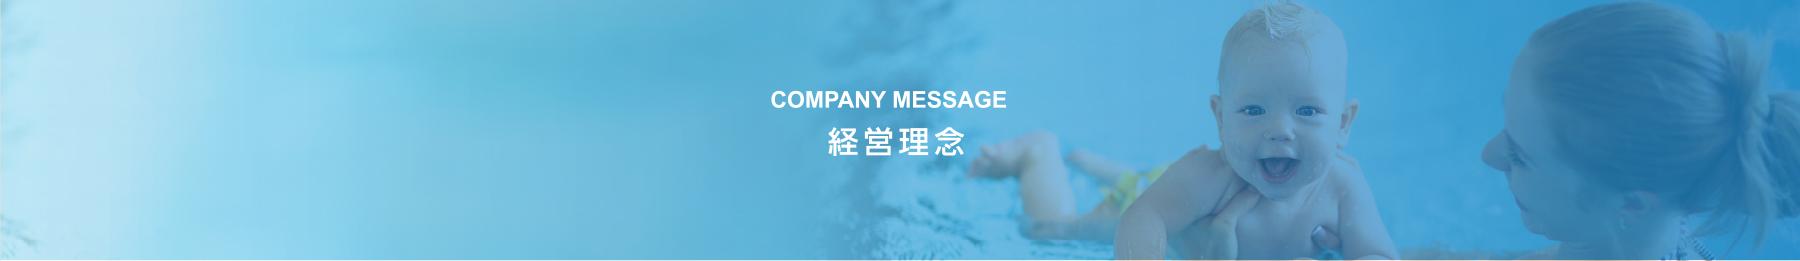 COMPANY MESSAGE 経営理念